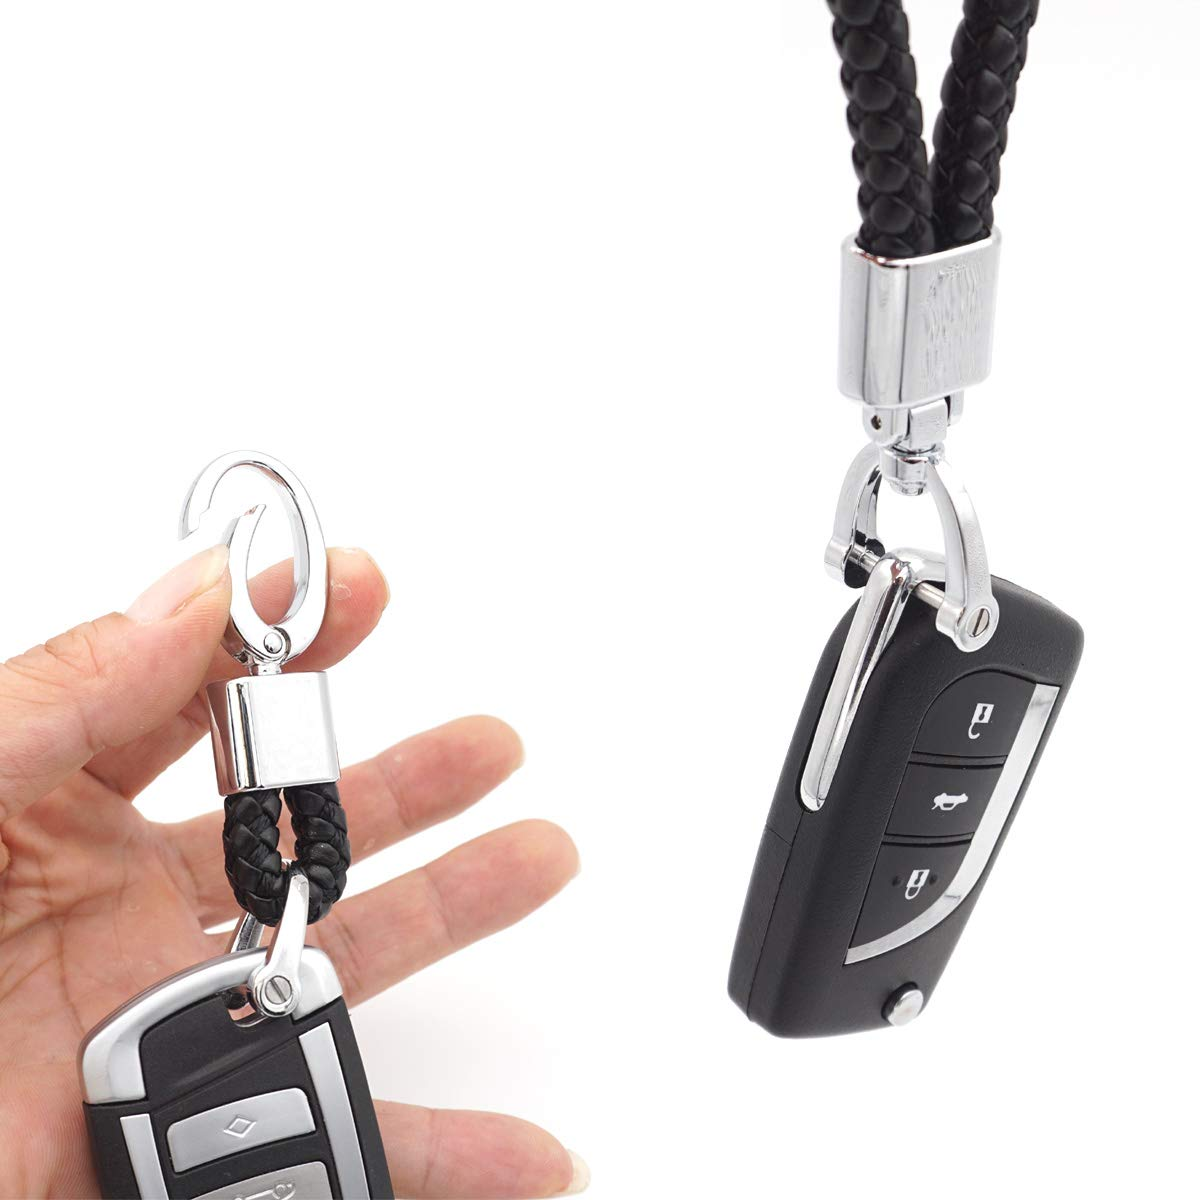 Silver+Black TM Royalfox 2 Pack Keychain Detachable Loop Ring Car Key Fob Chain for Men Women Fit VW Honda Mercedes Benz BMW Ford Audi Nissan Infiniti Toyota Jeep Dodge Cadillac Lexus